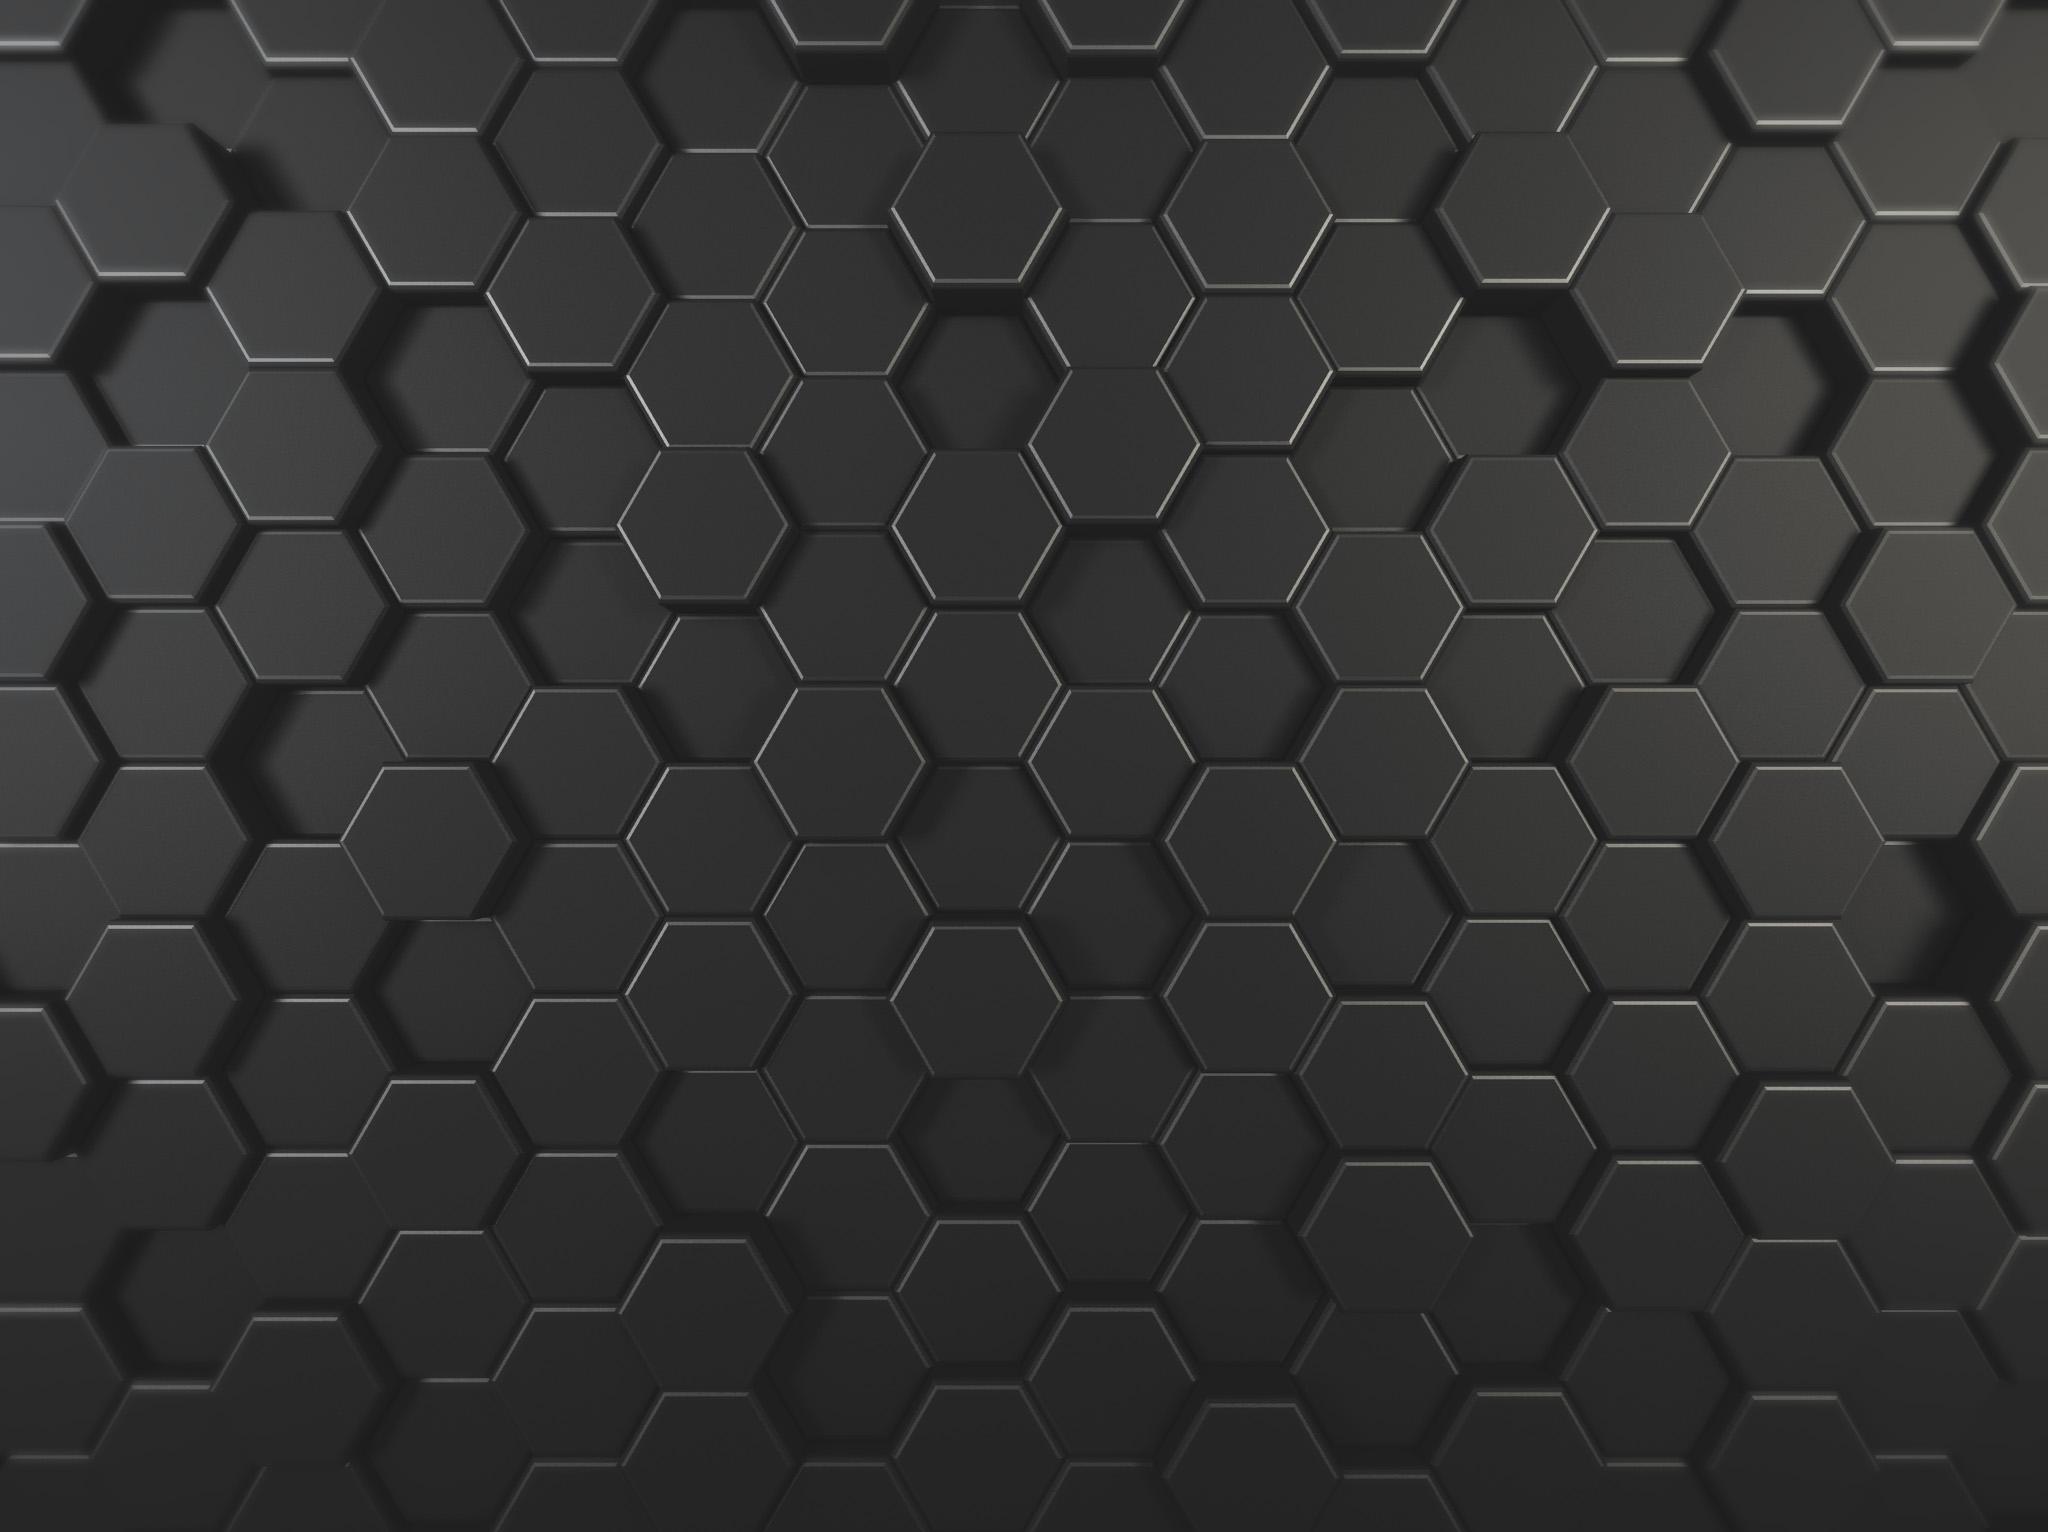 3d Wallpaper For Ipad: Ipad 3D Blocks Wallpaper Homage By Scifinity On DeviantArt